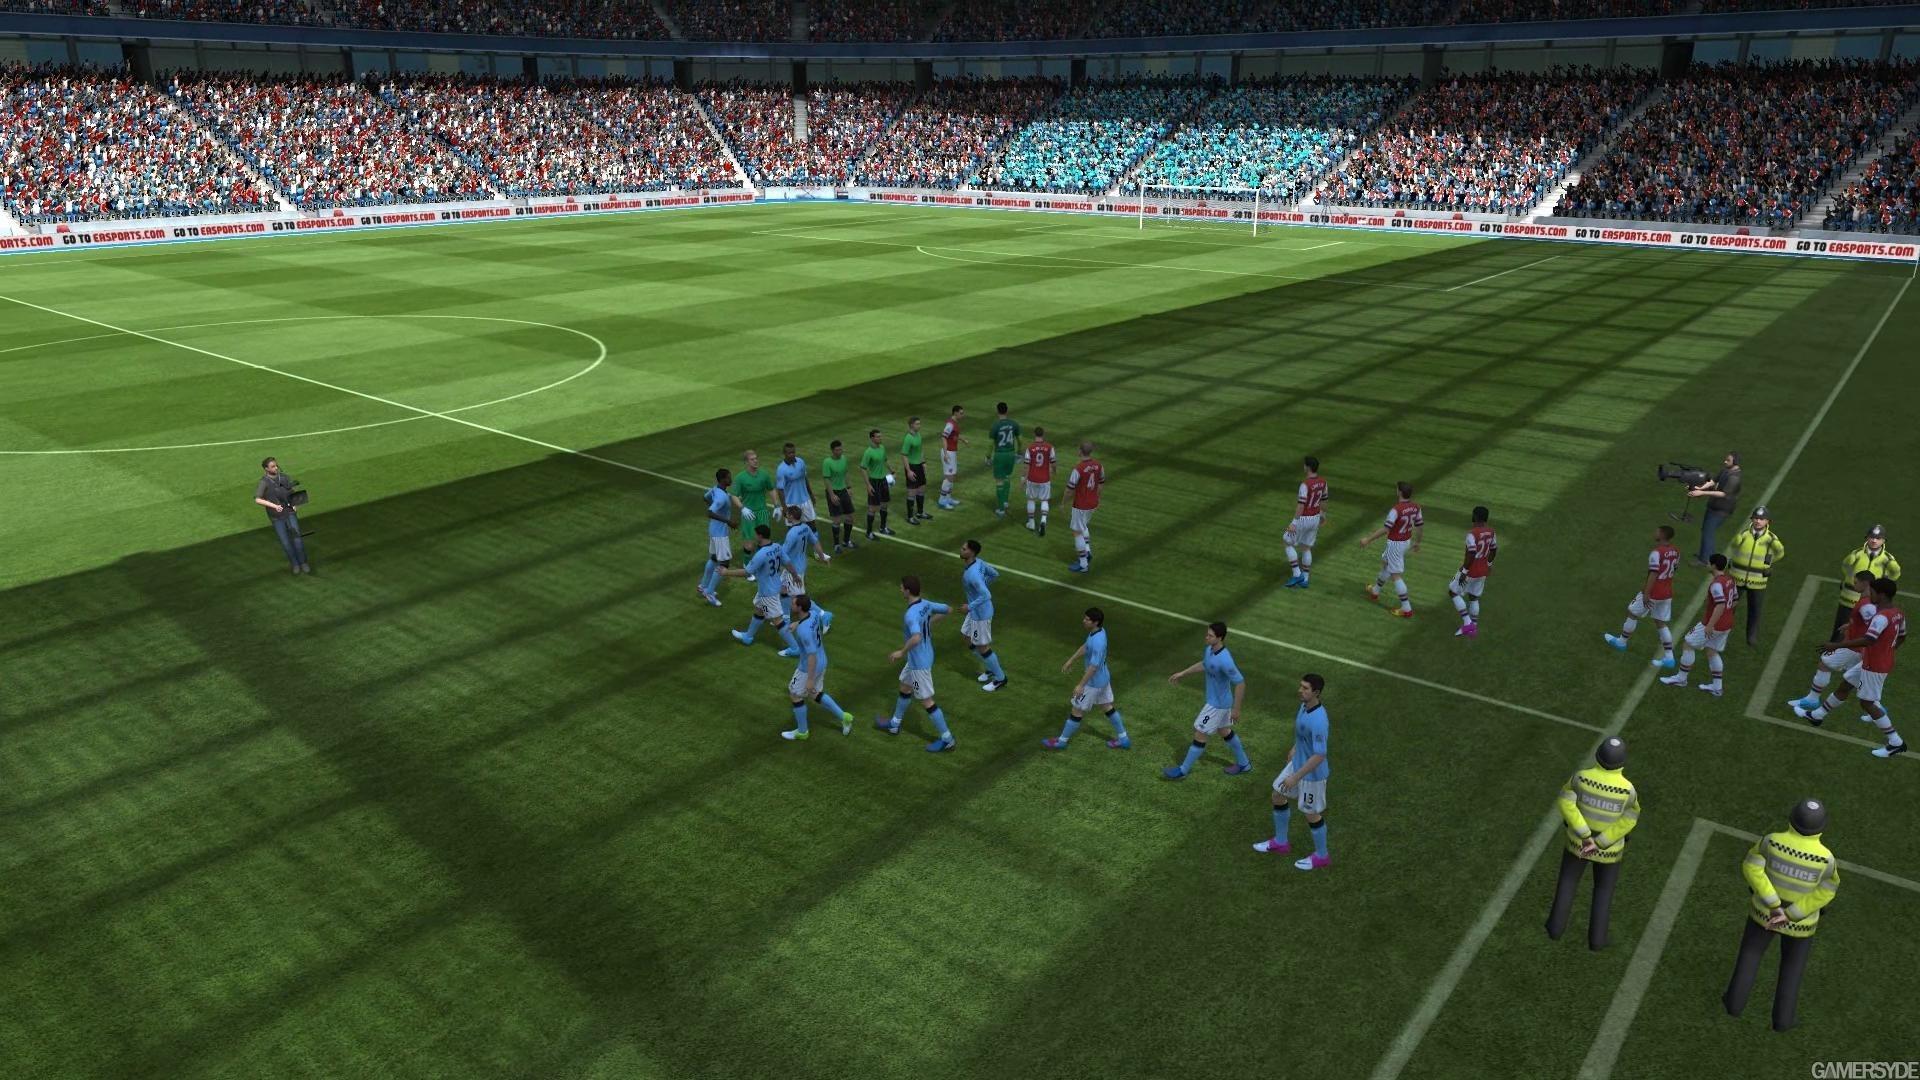 image fifa 13 20261 2509 0005 تصاویر جدید از بازی FIFA 13